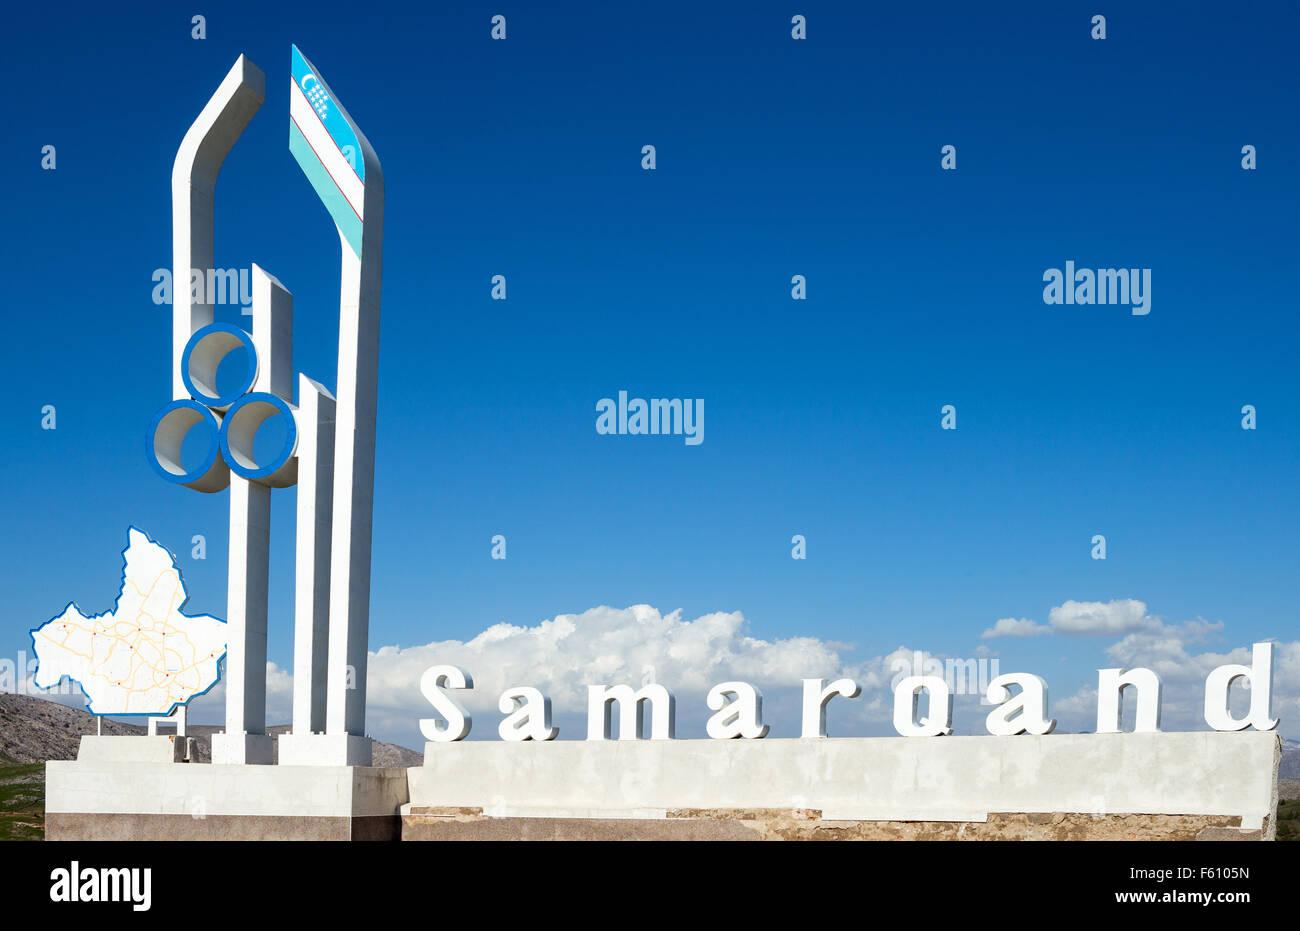 Uzbekistan, Samarkand, the big sign that marks the entrance to the Samarkand region - Stock Image